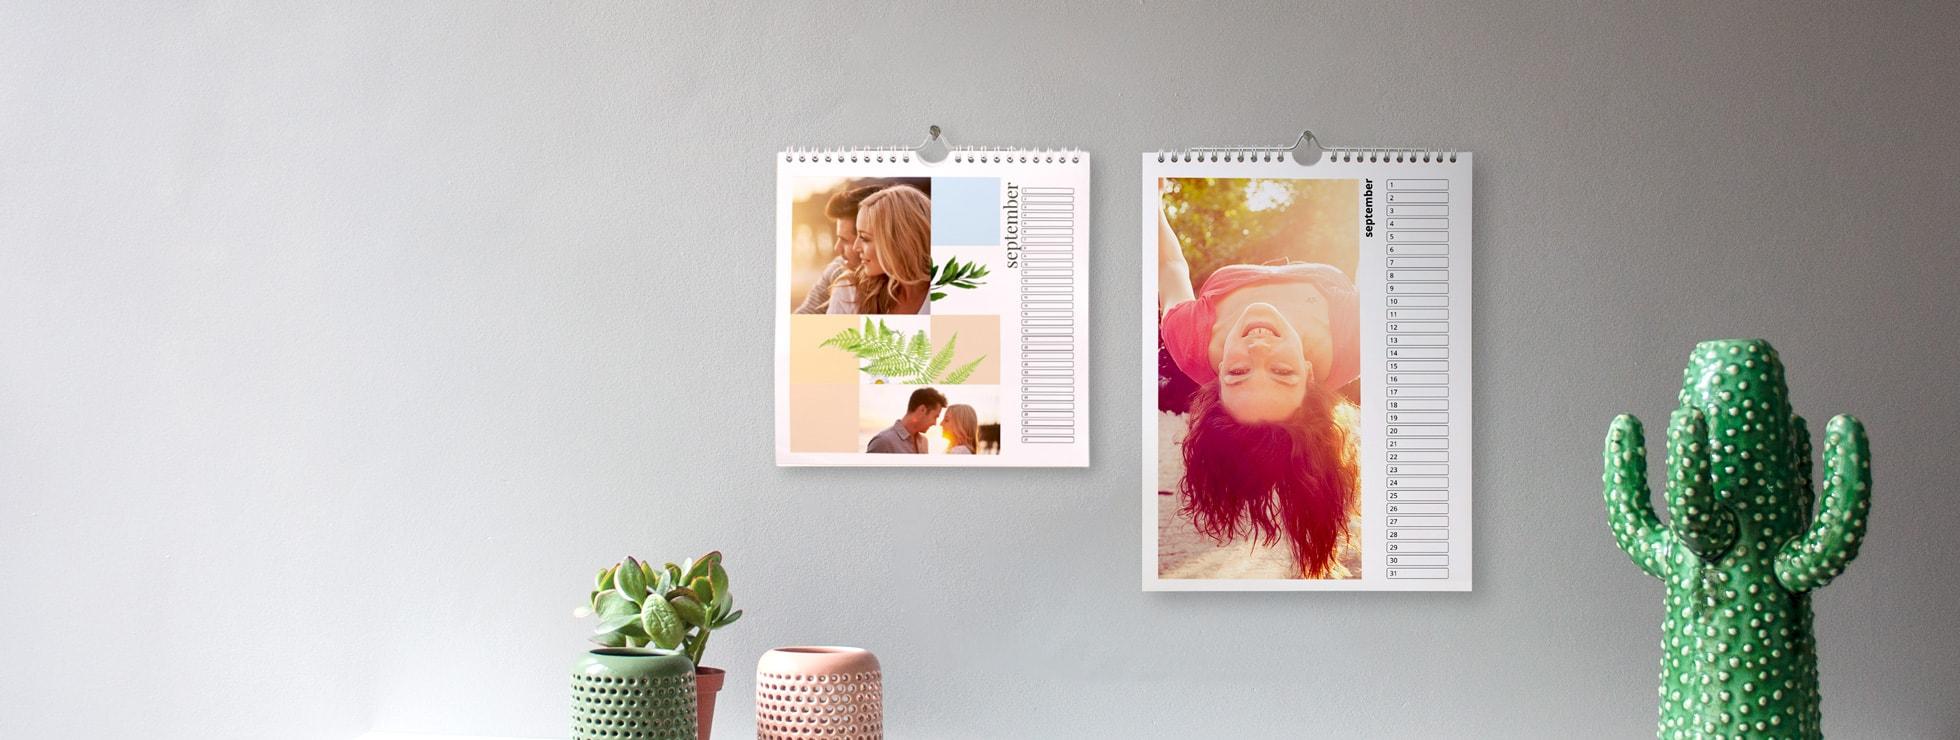 Wonderbaar Familiekalender maken met je eigen foto's | albelli KG-19